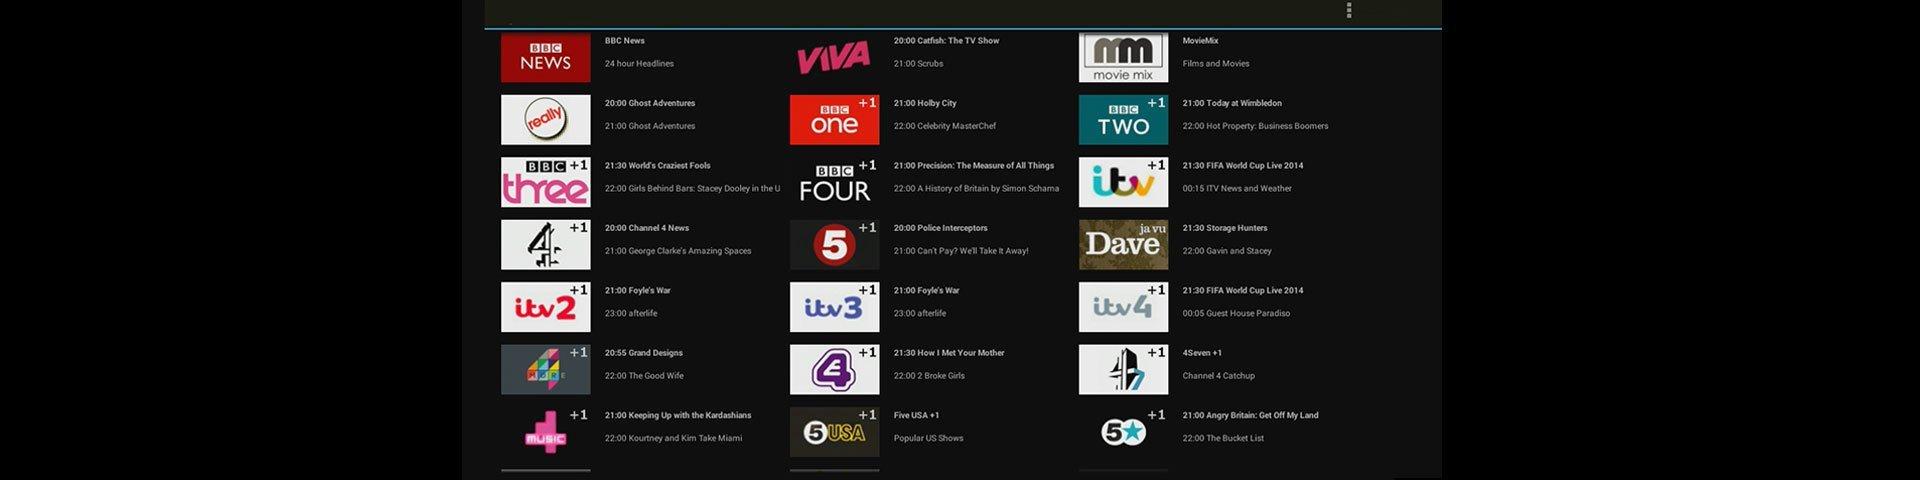 Programme listing